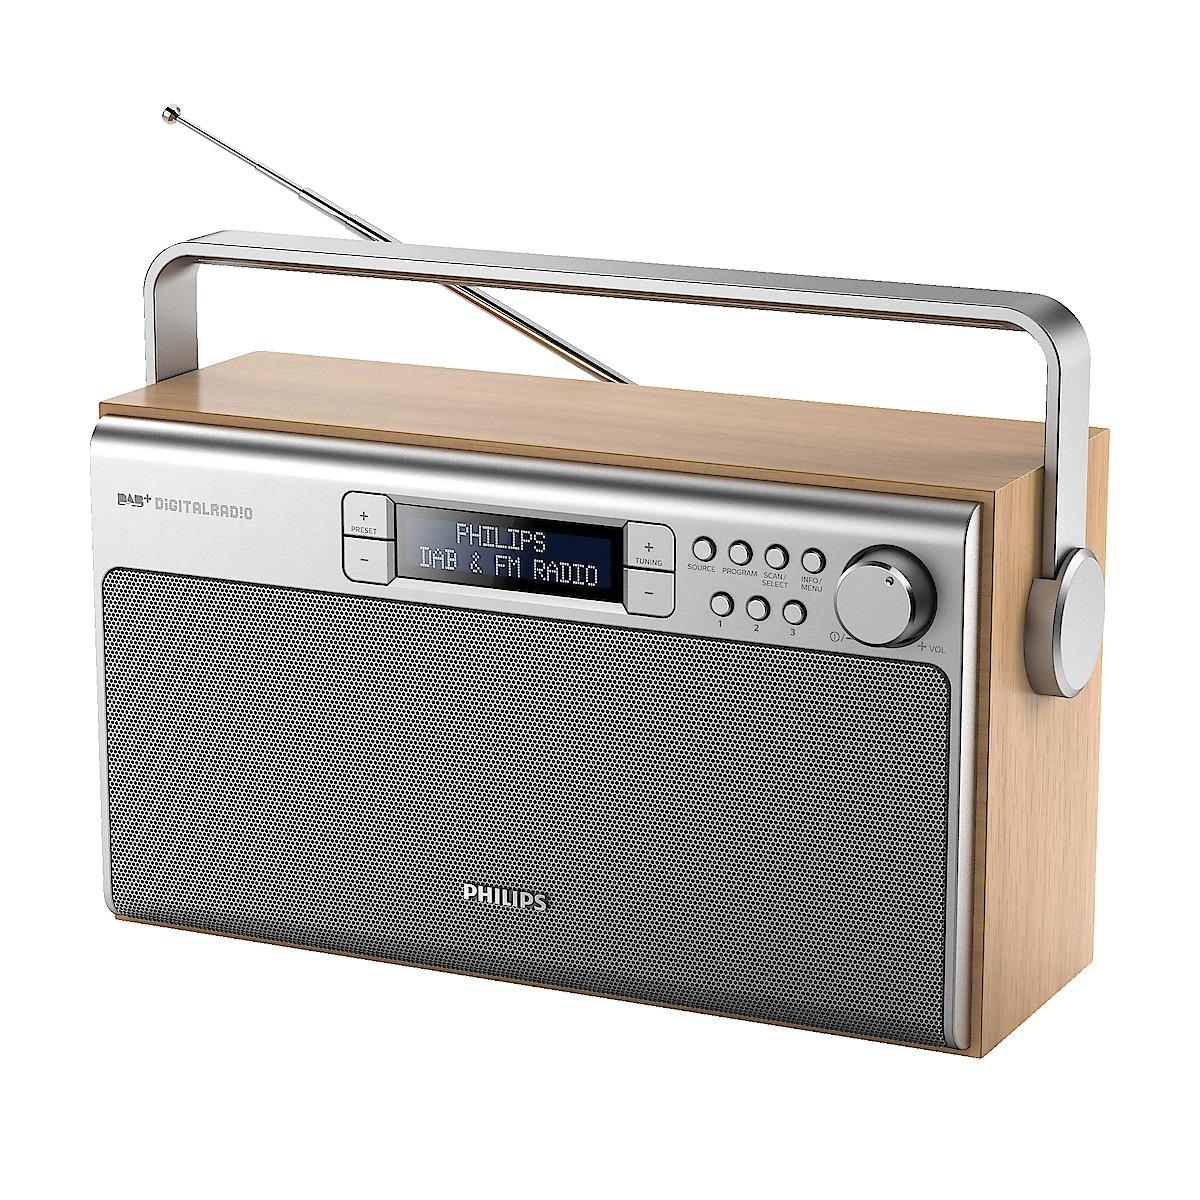 Philips AE5220 DAB+/FM-radio